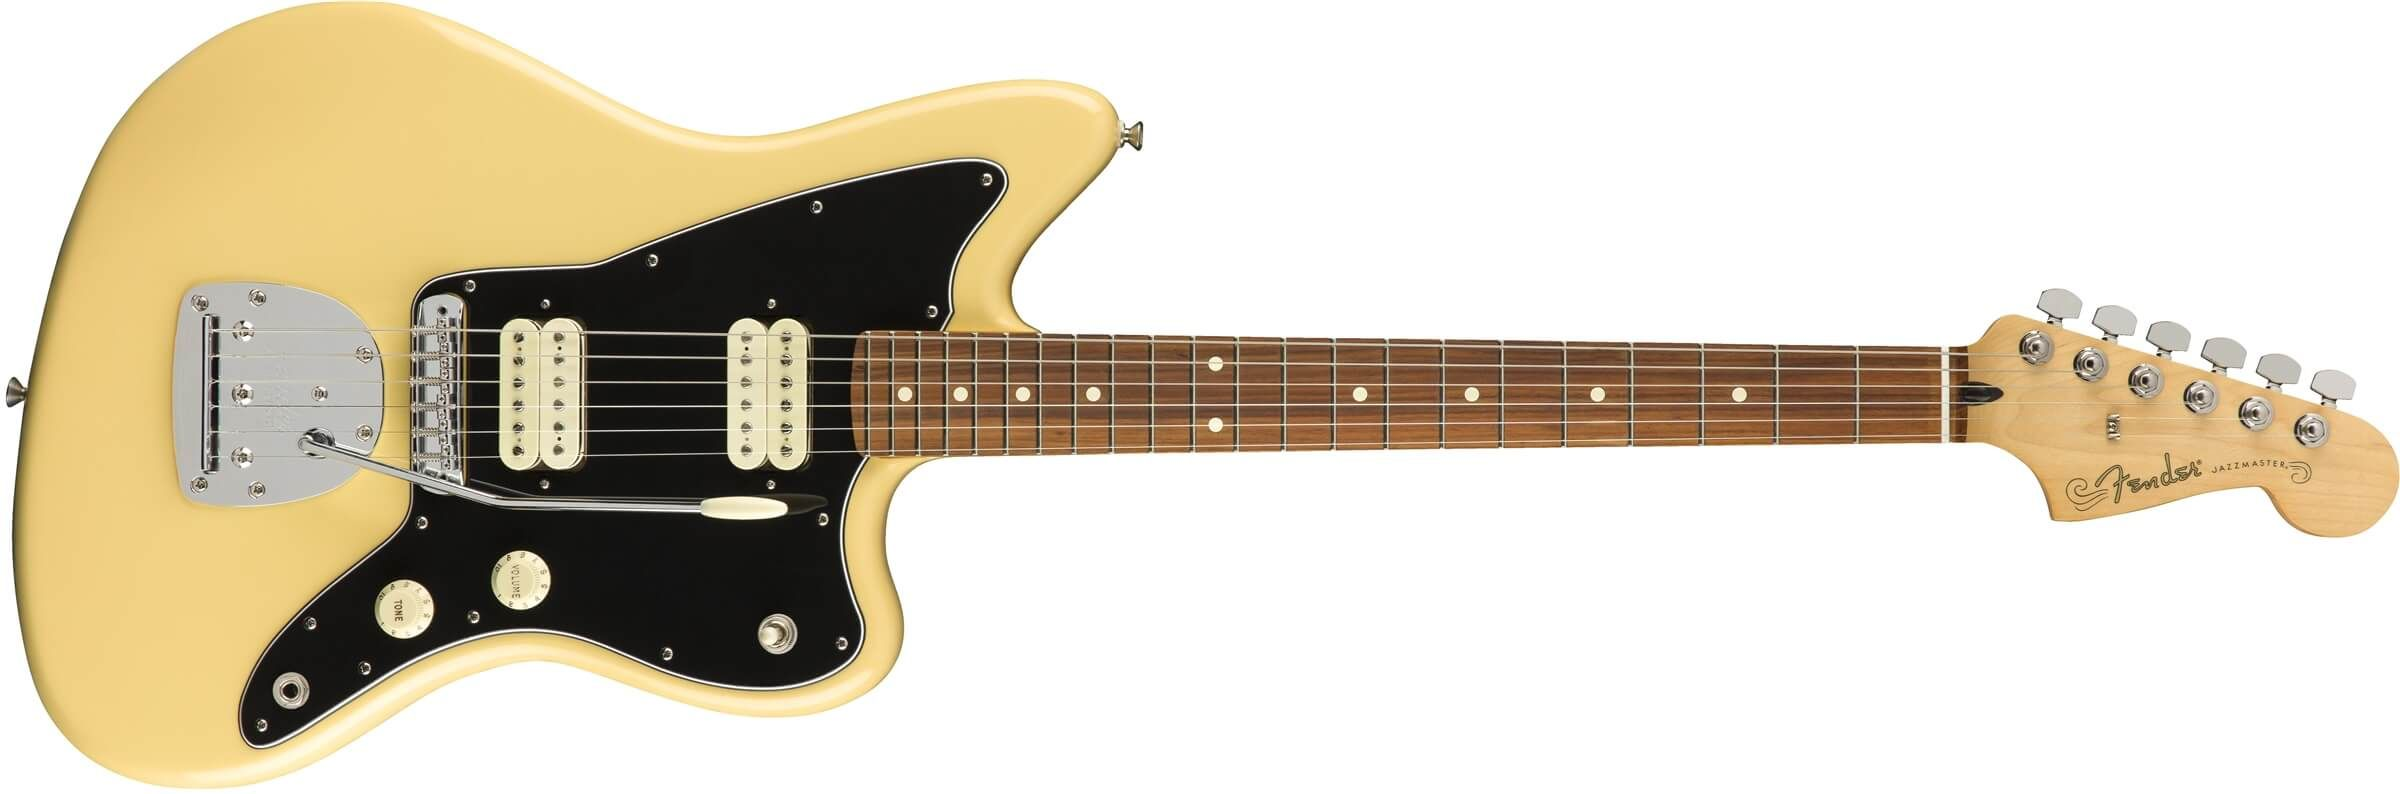 Ramirez Studio 1 Classical Guitar | Classical guitar